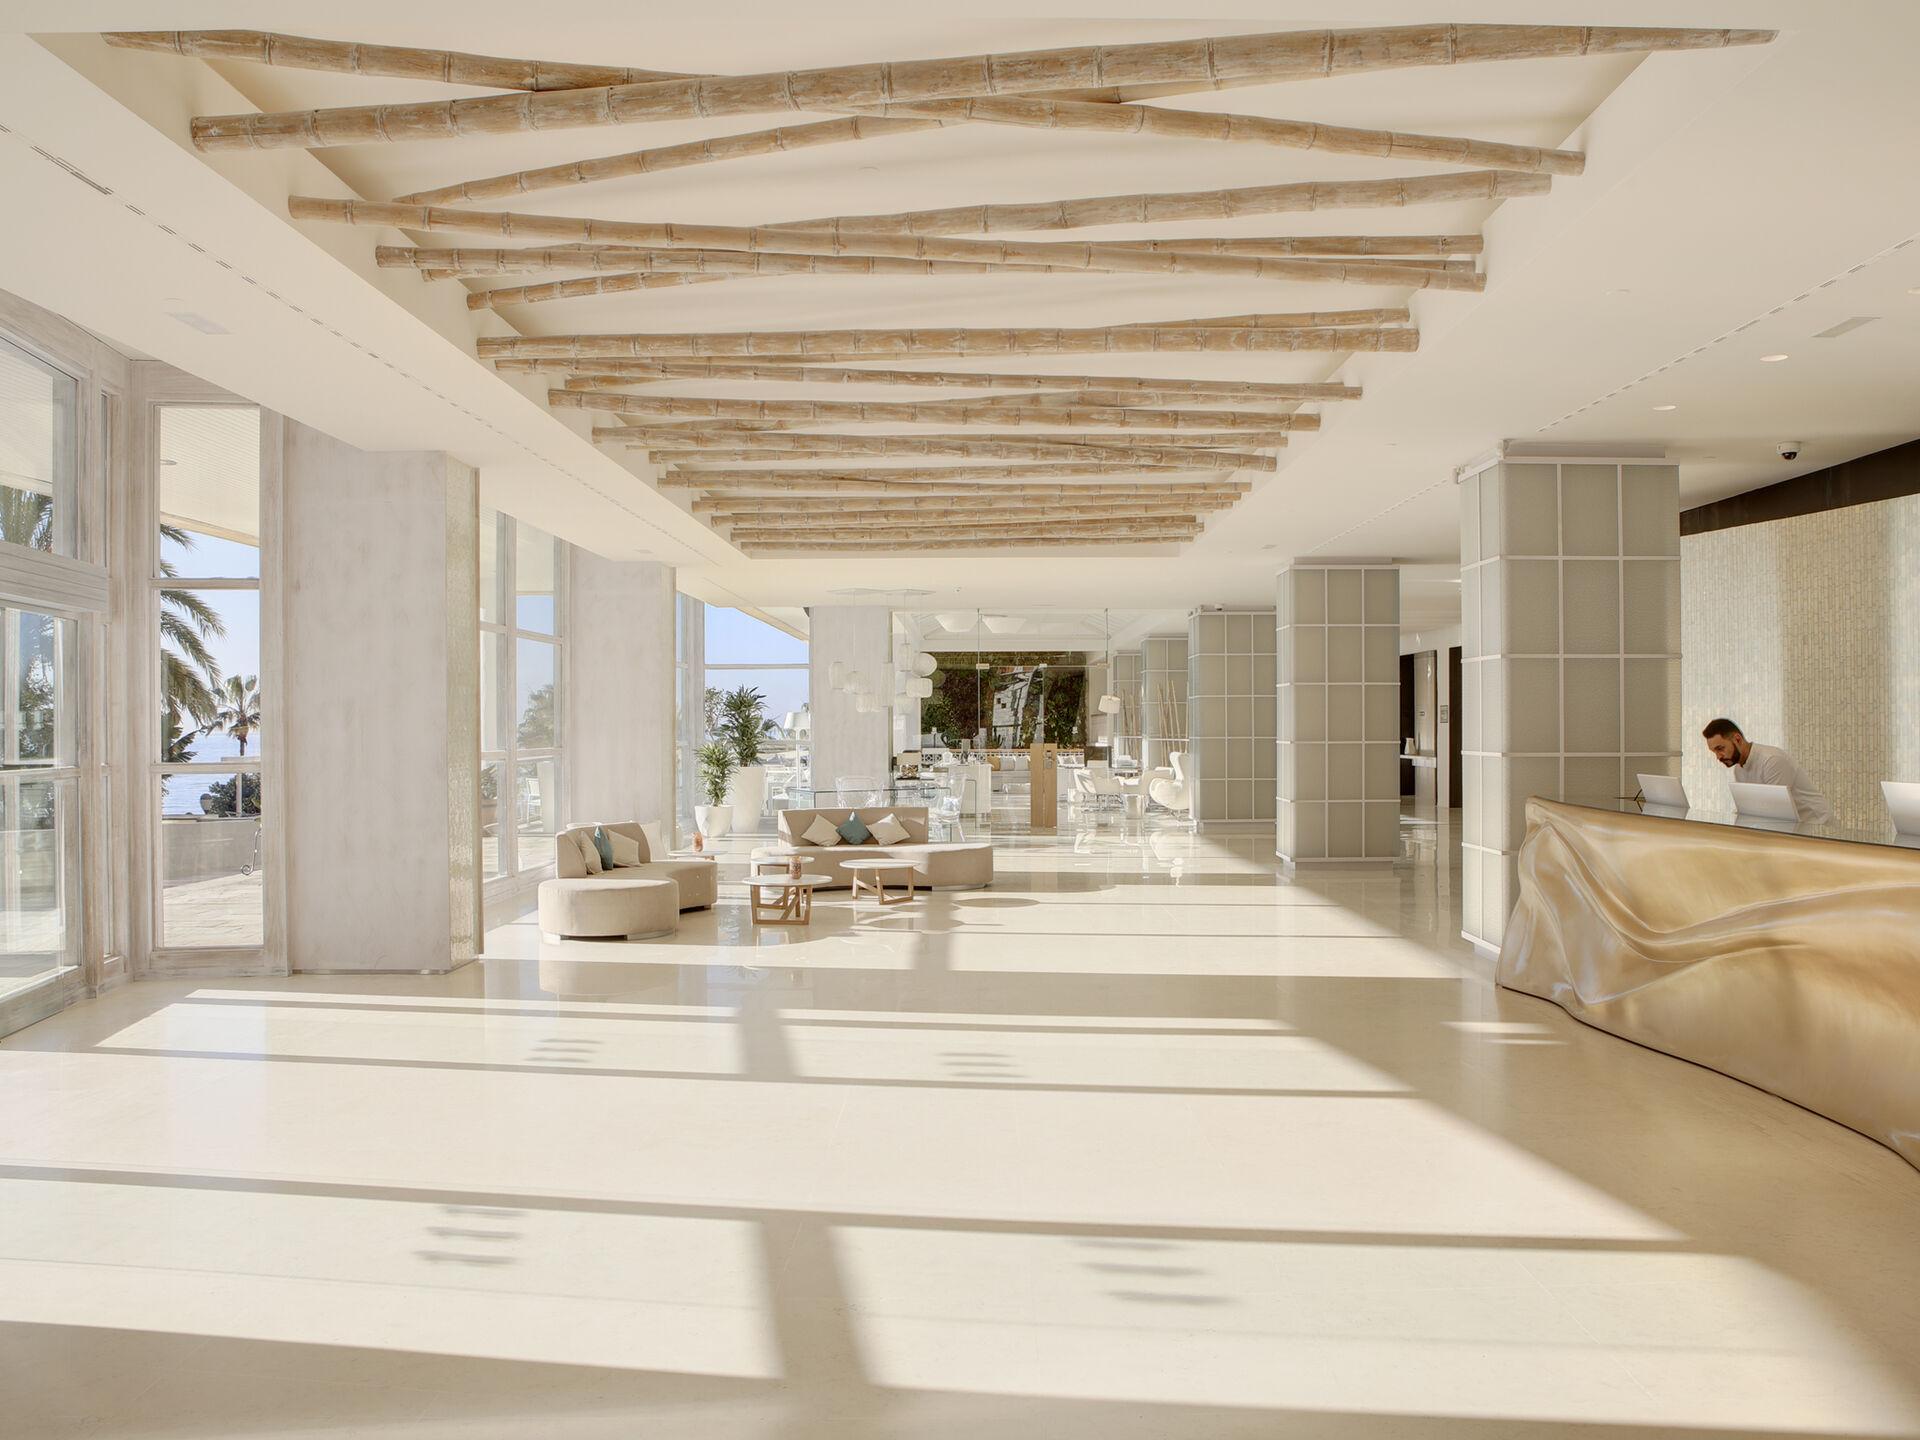 https://cms.satur.sk/data/imgs/tour_image/orig/amare-marbella-instalaciones-recepcion-6-1972141.jpg